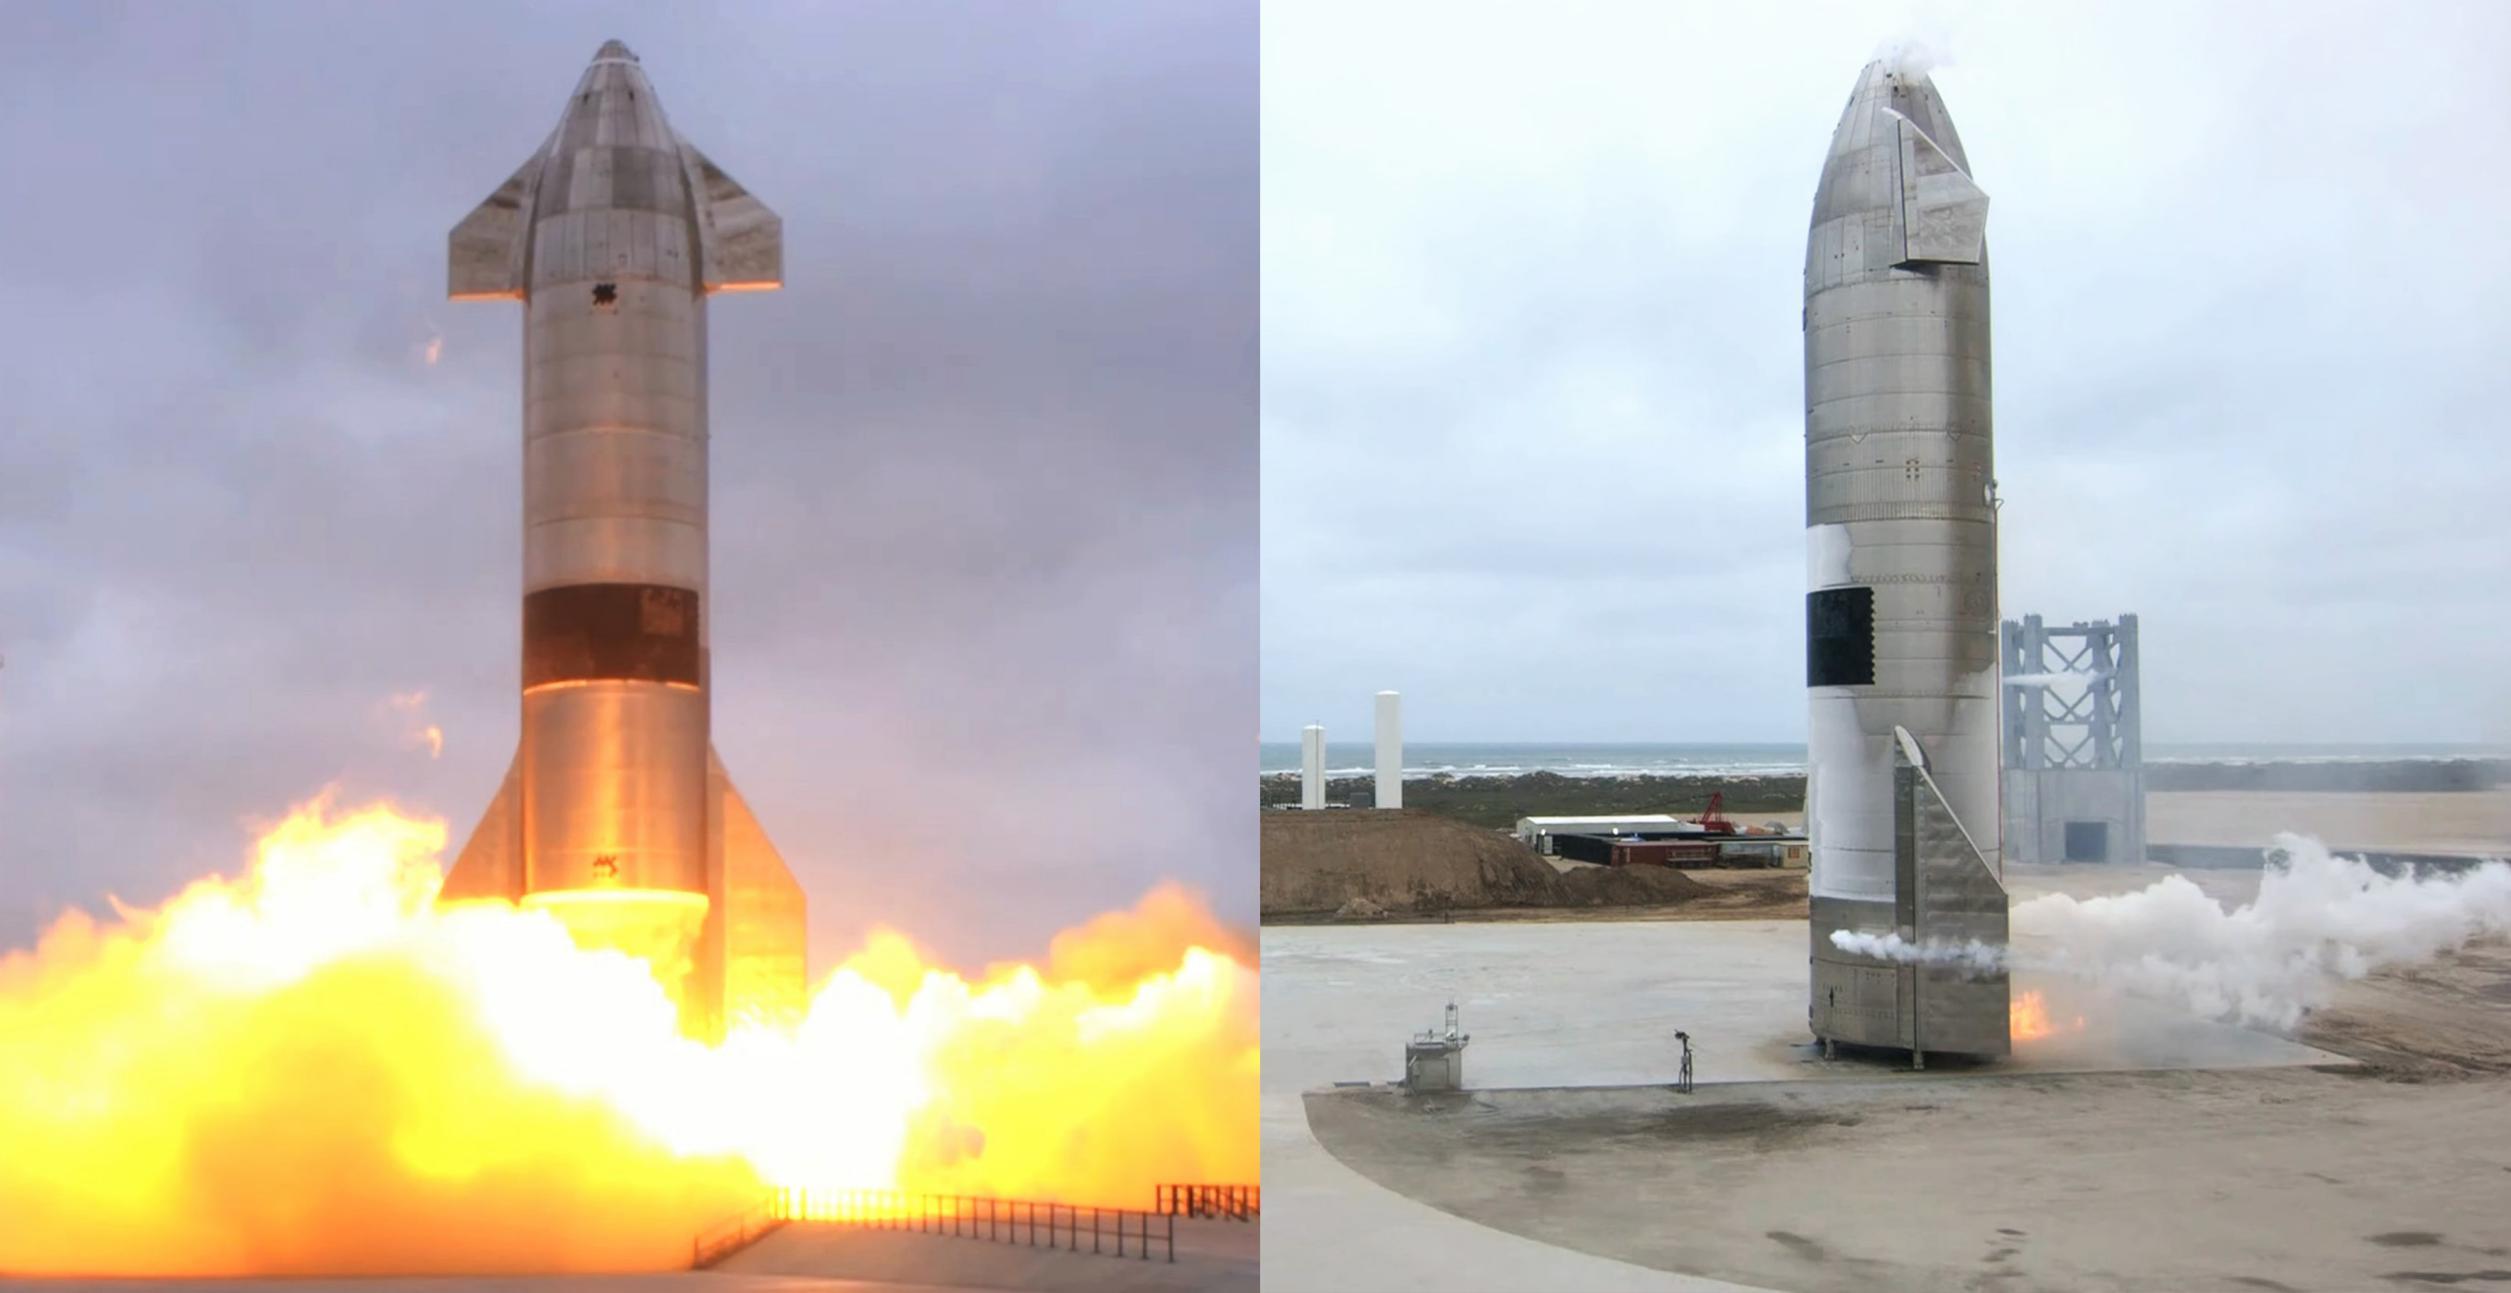 Starship SN15 10km flight test 050521 webcast (SpaceX) launch 1 (c)